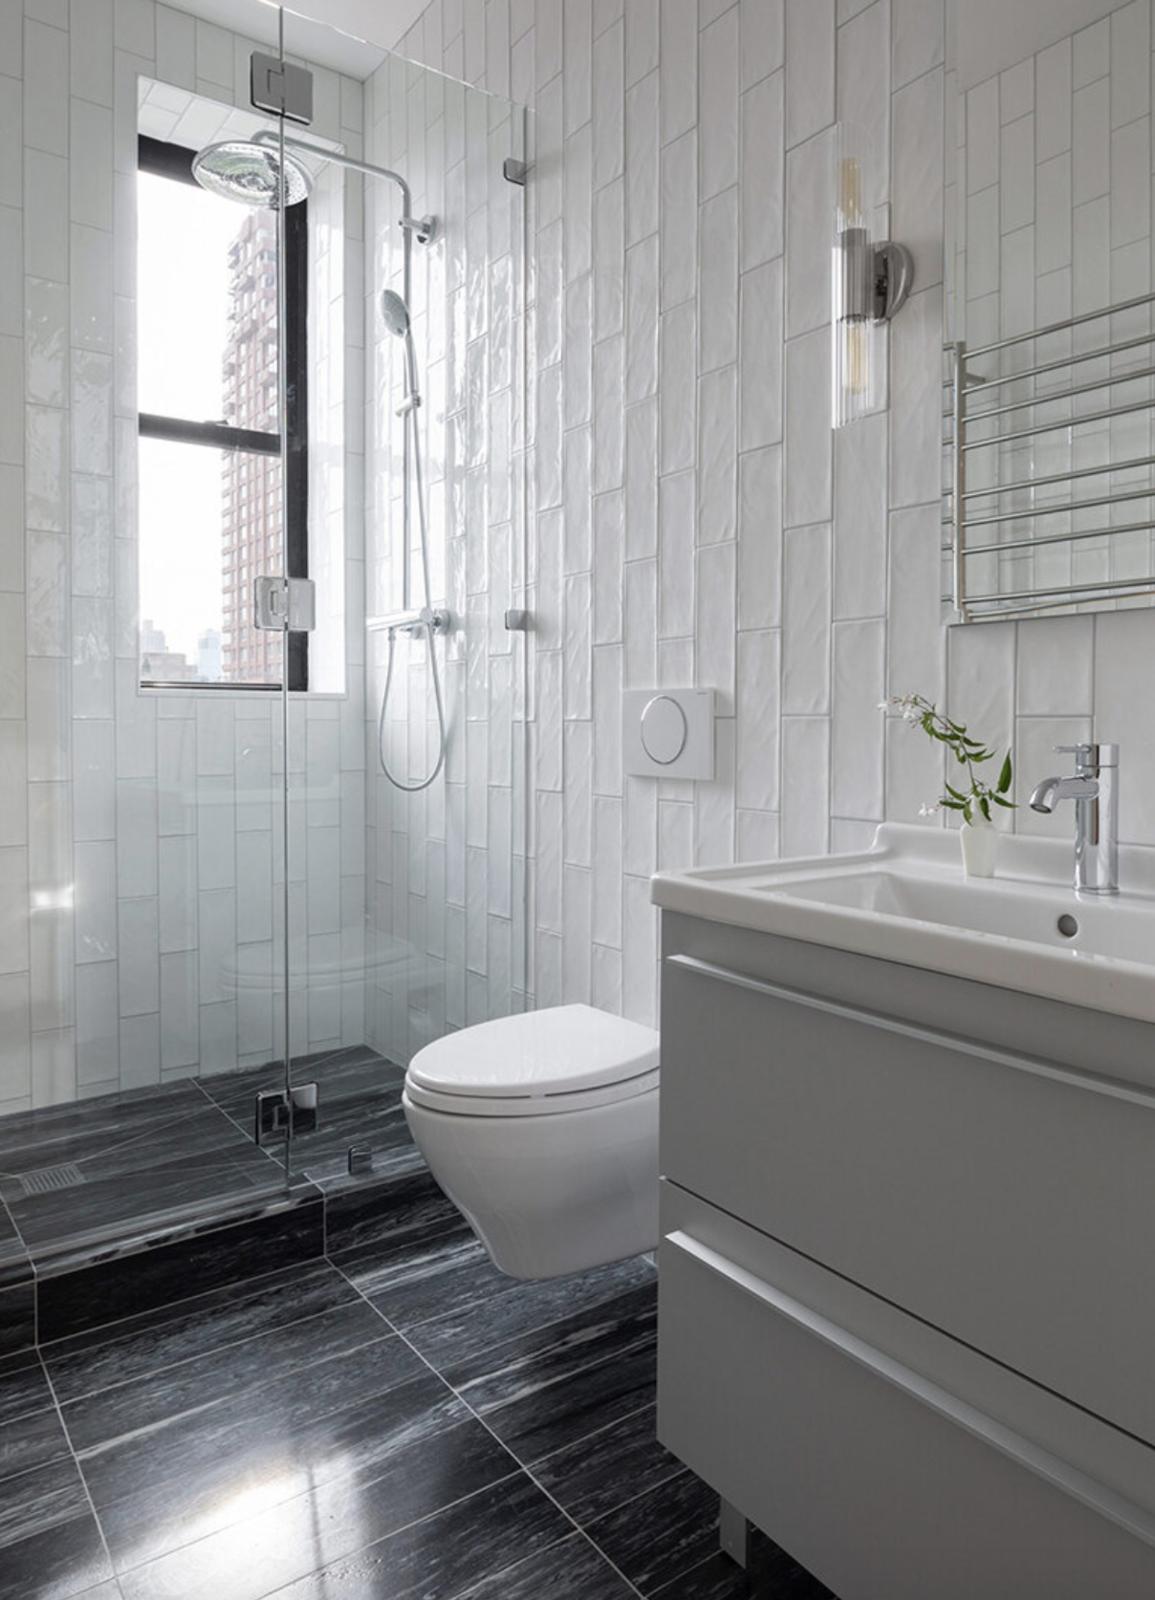 Durodeco Upper West Side Studio bathroom